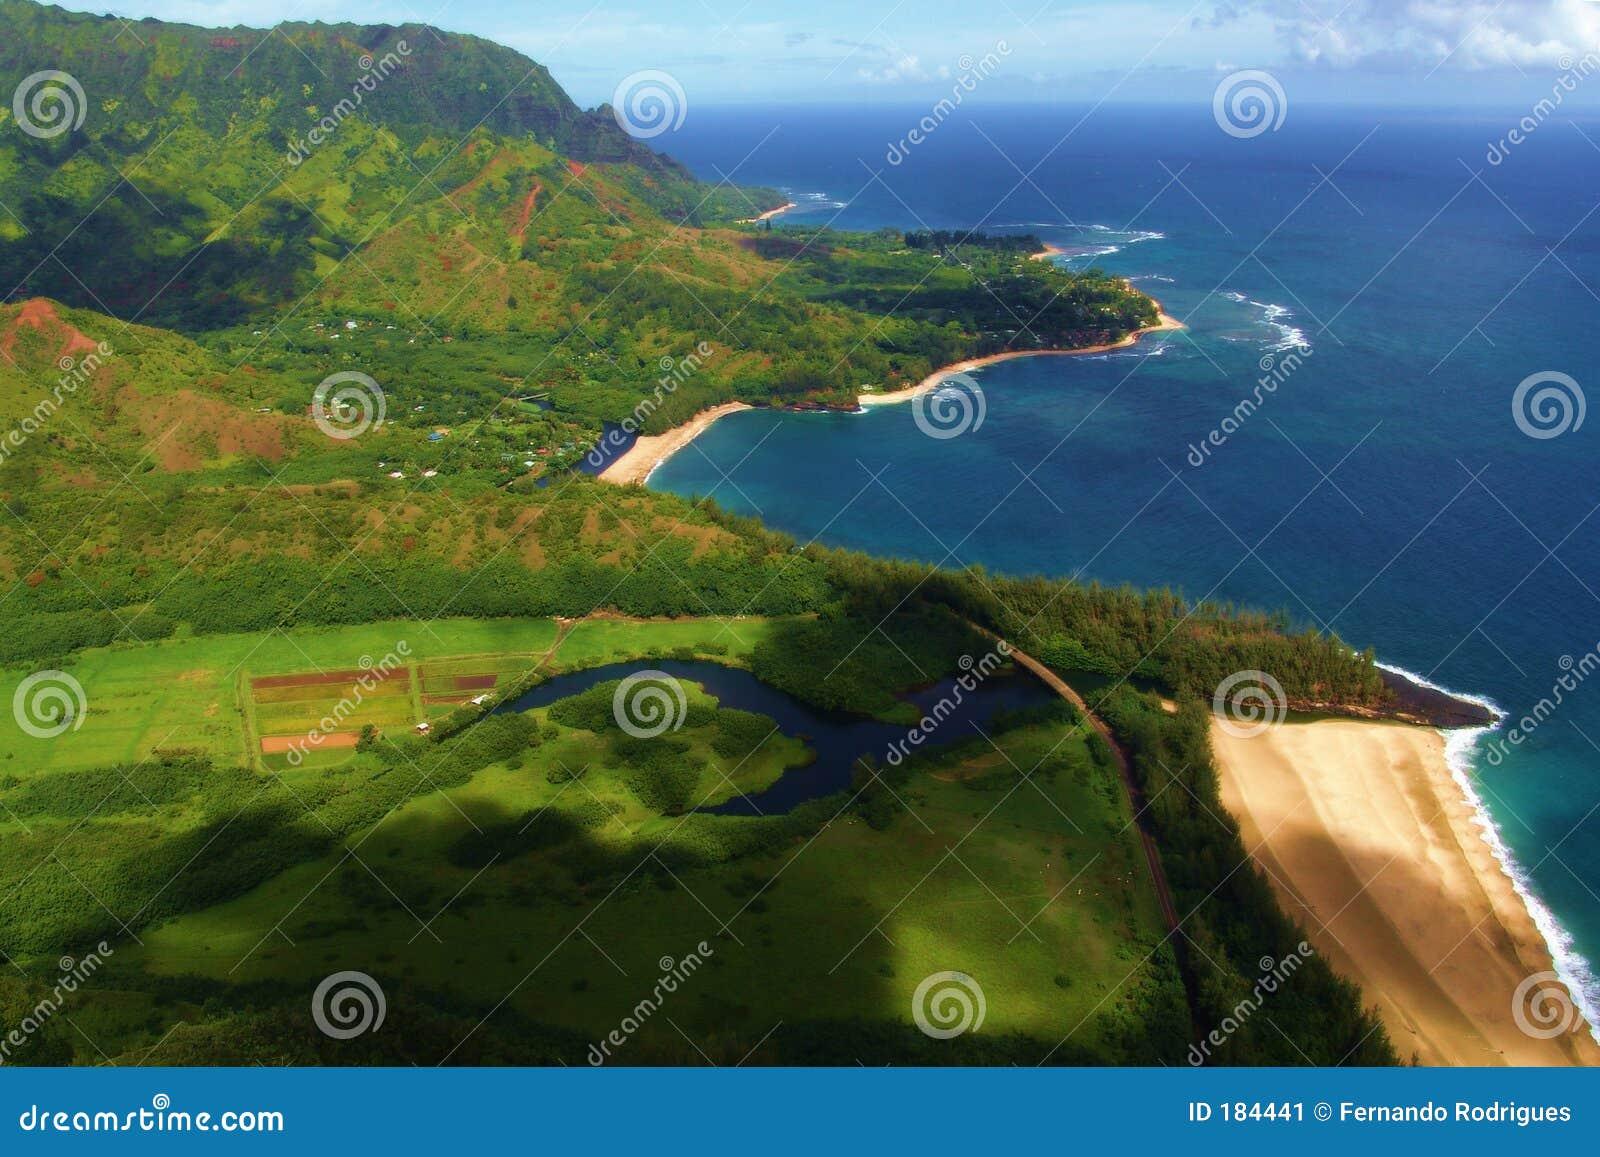 Playa vista de mid-air